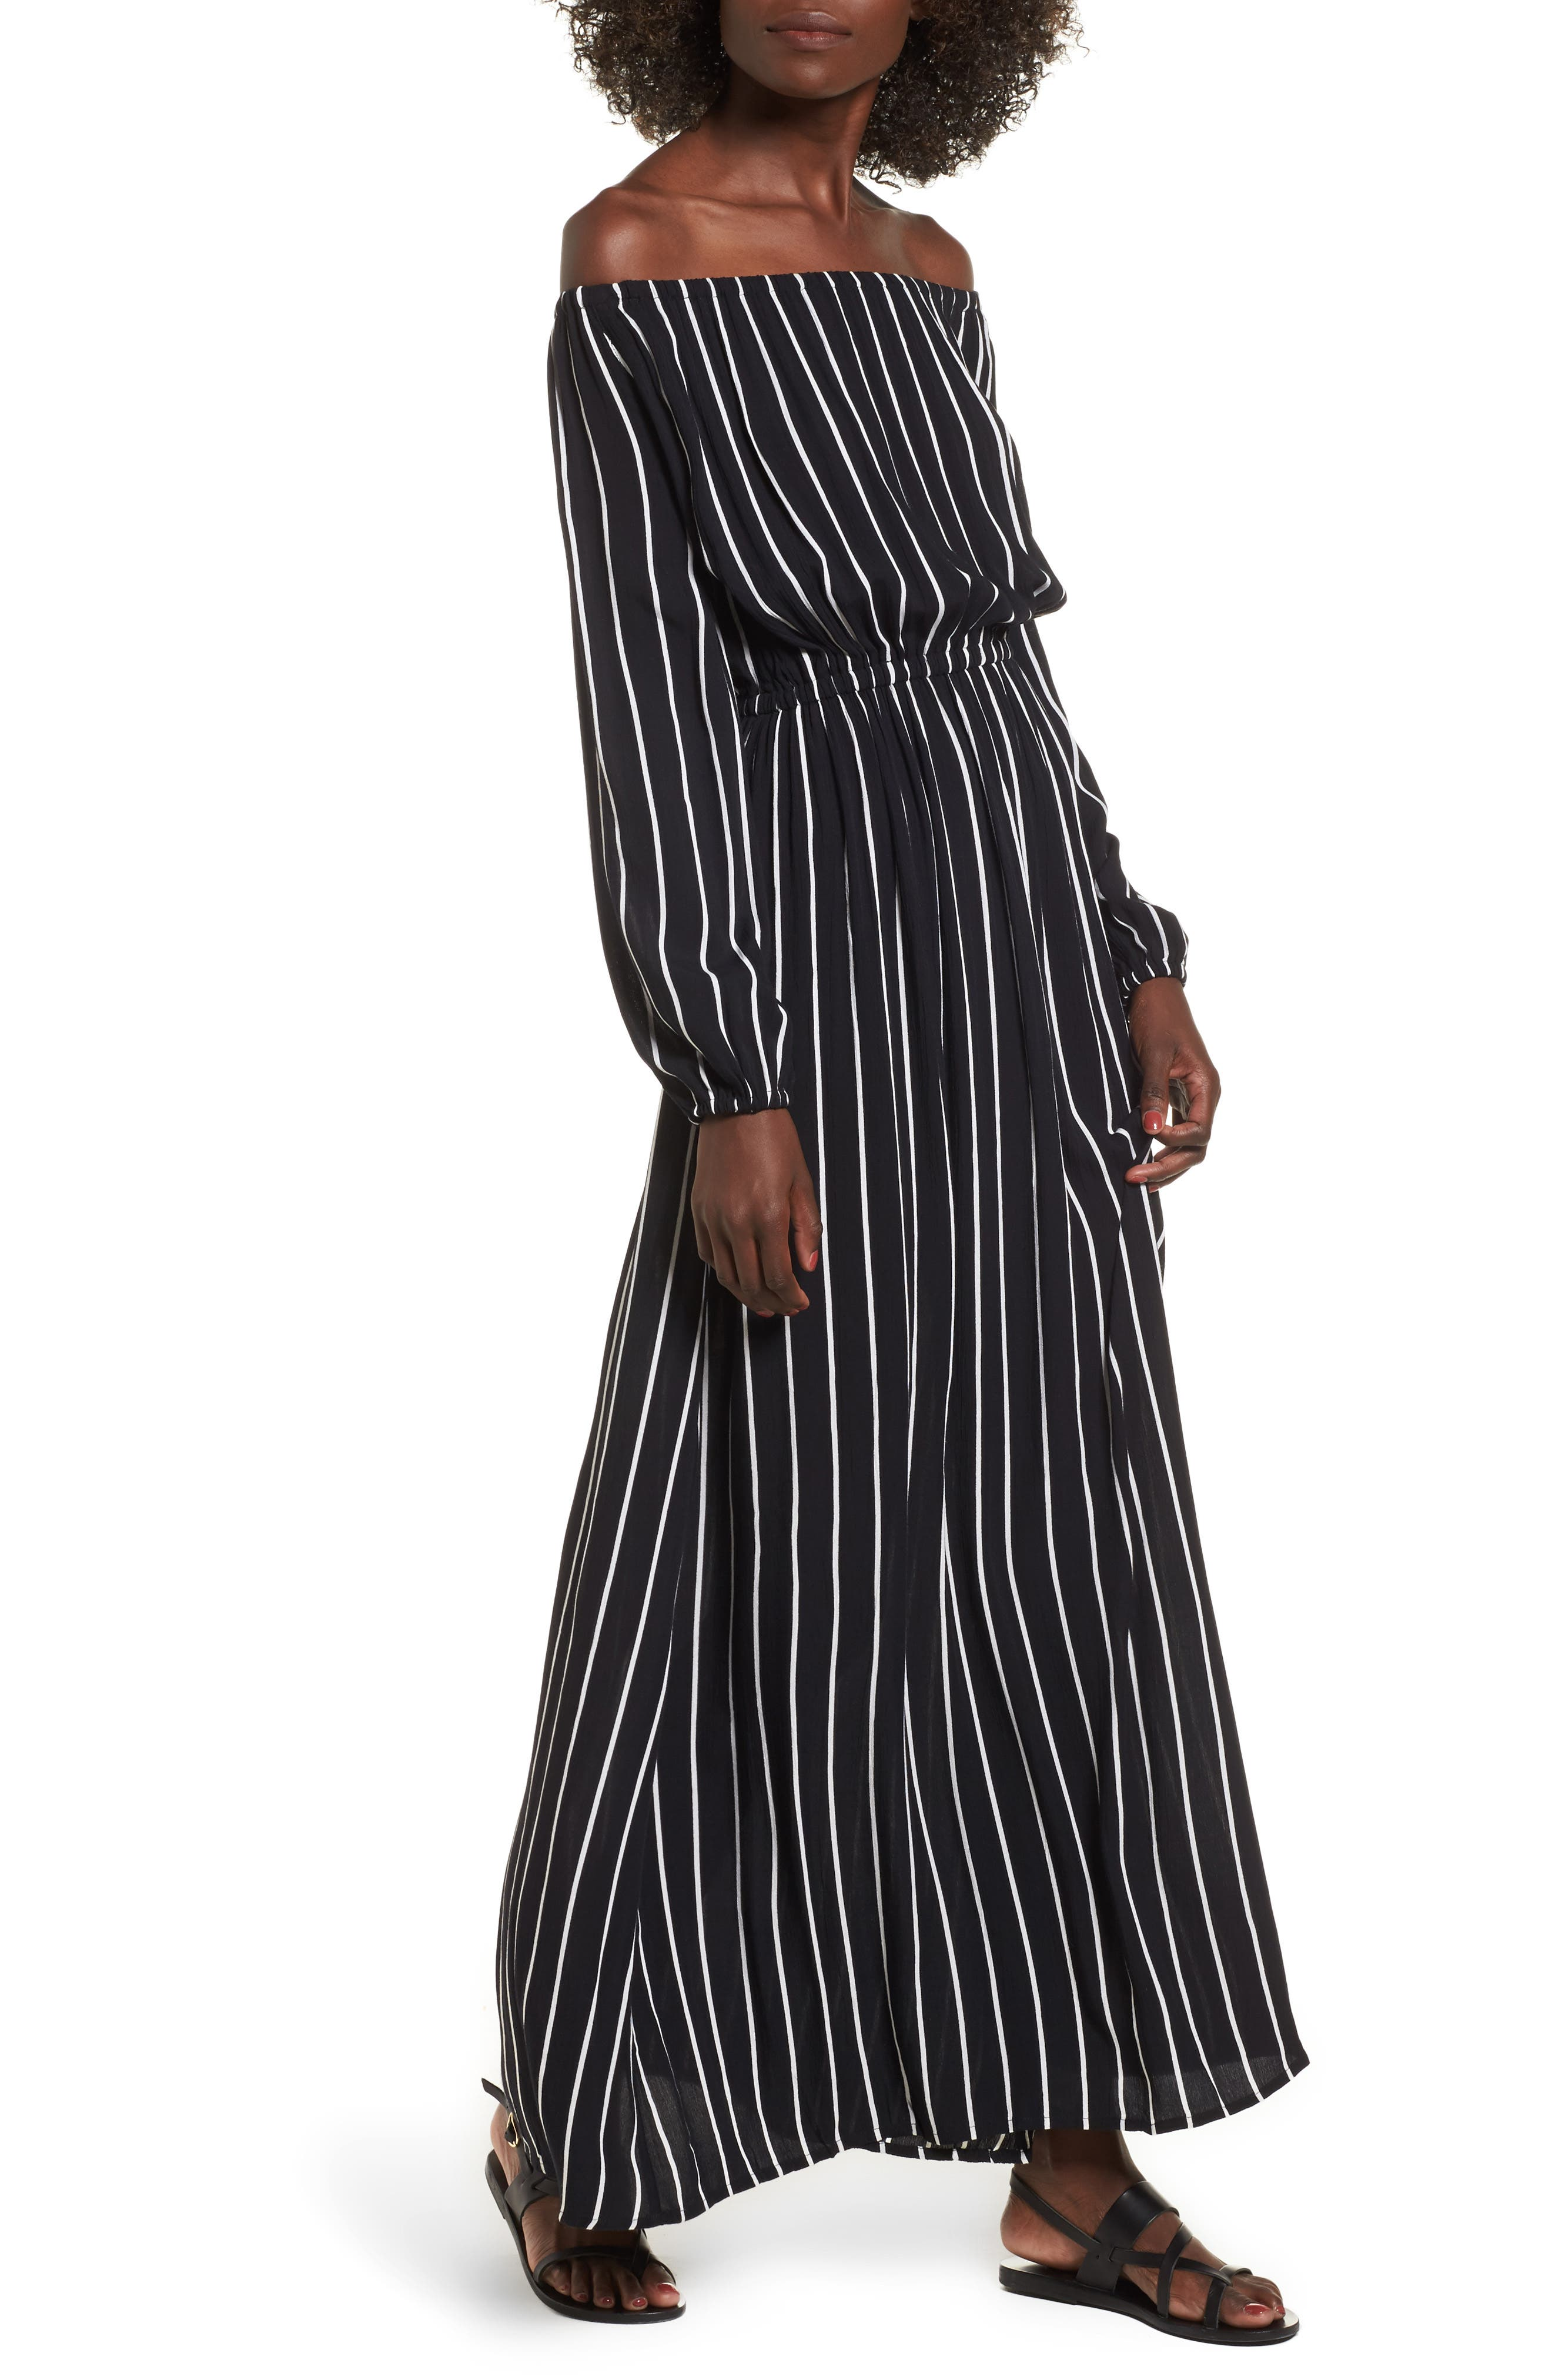 Crystal Ball Off the Shoulder Maxi Dress,                         Main,                         color, Black